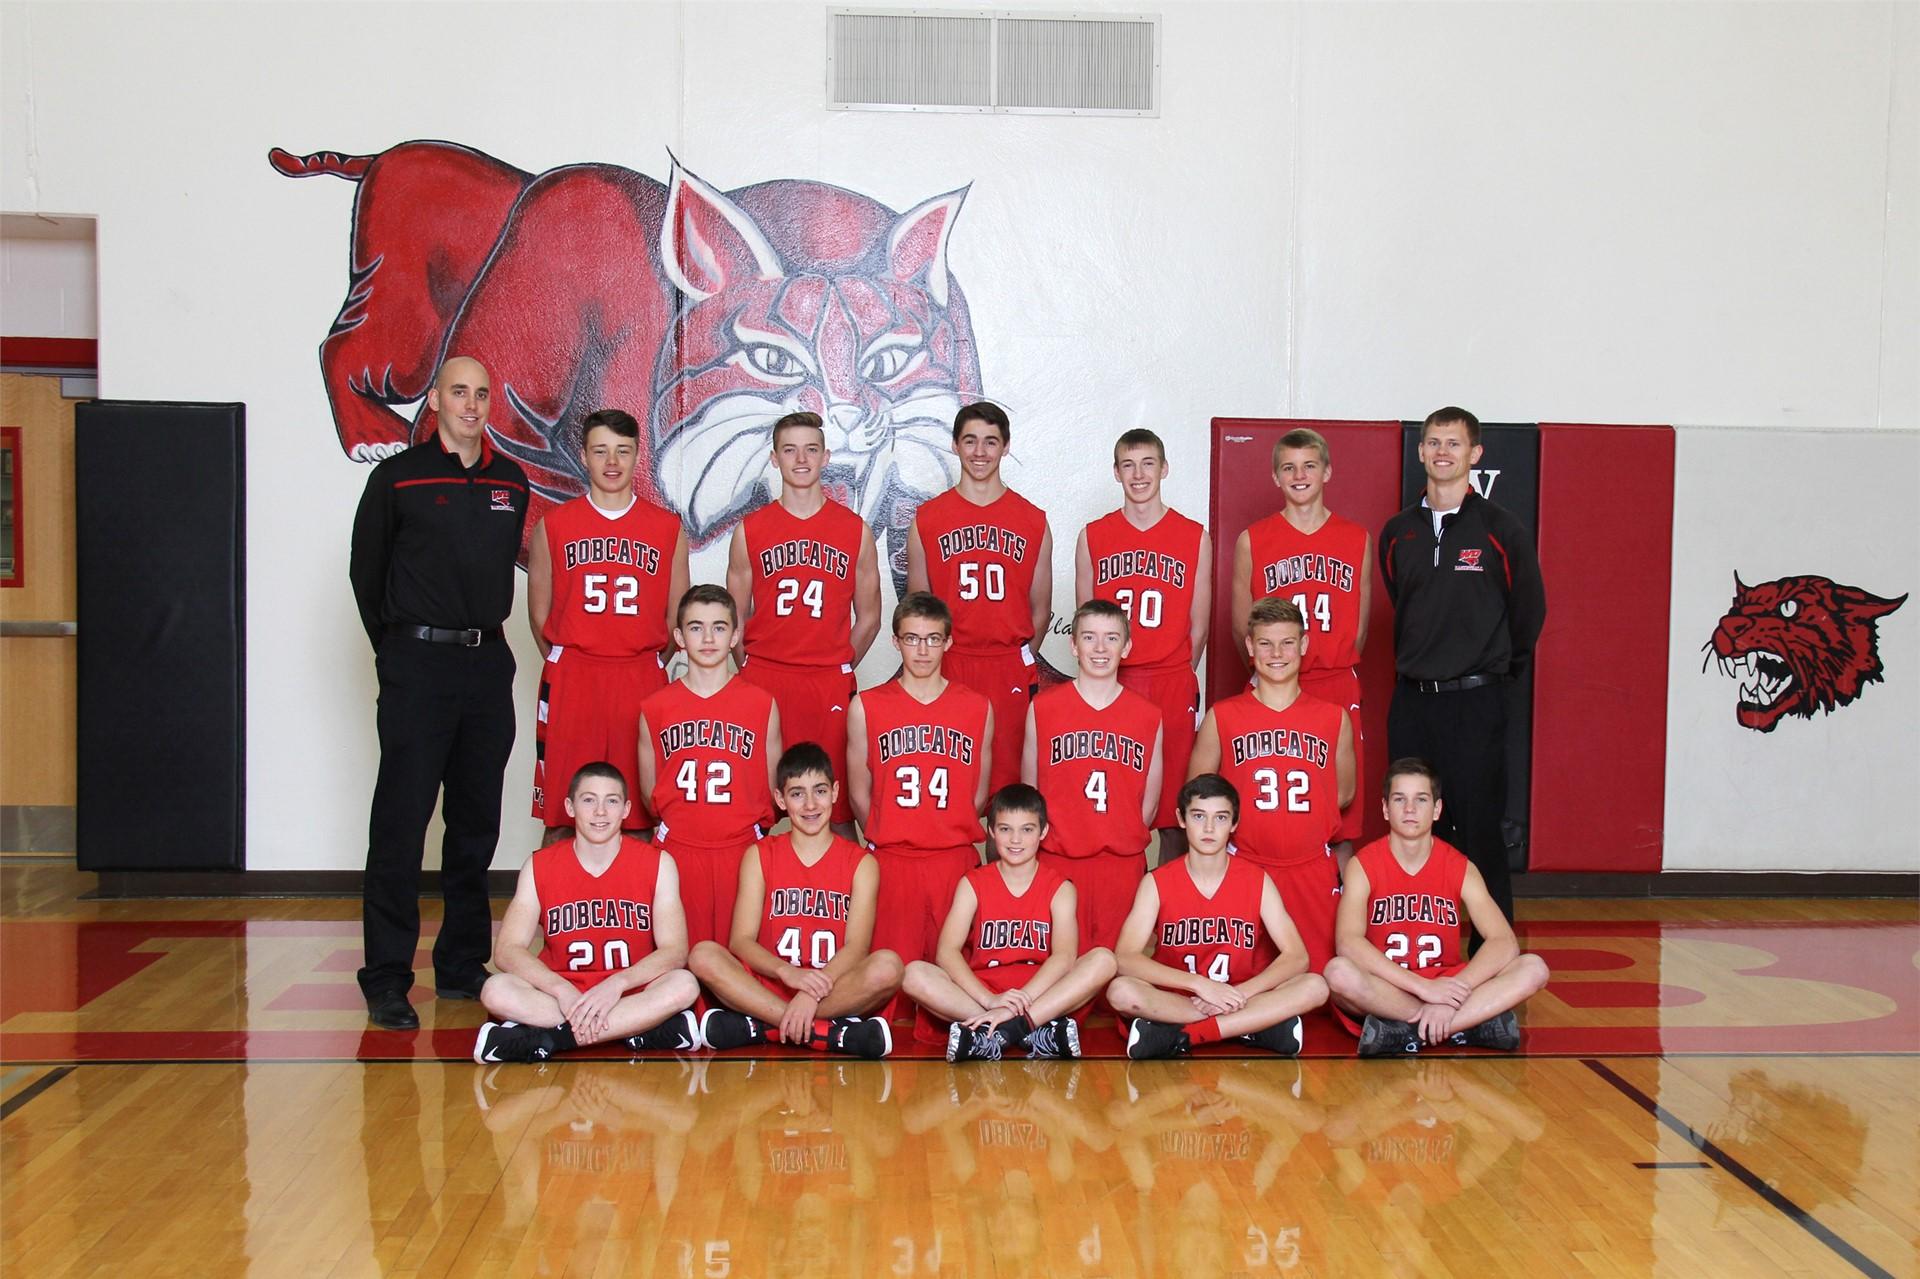 Freshmen Boys Basketball - Coaches Grant Wulf & Hunter Westhoff